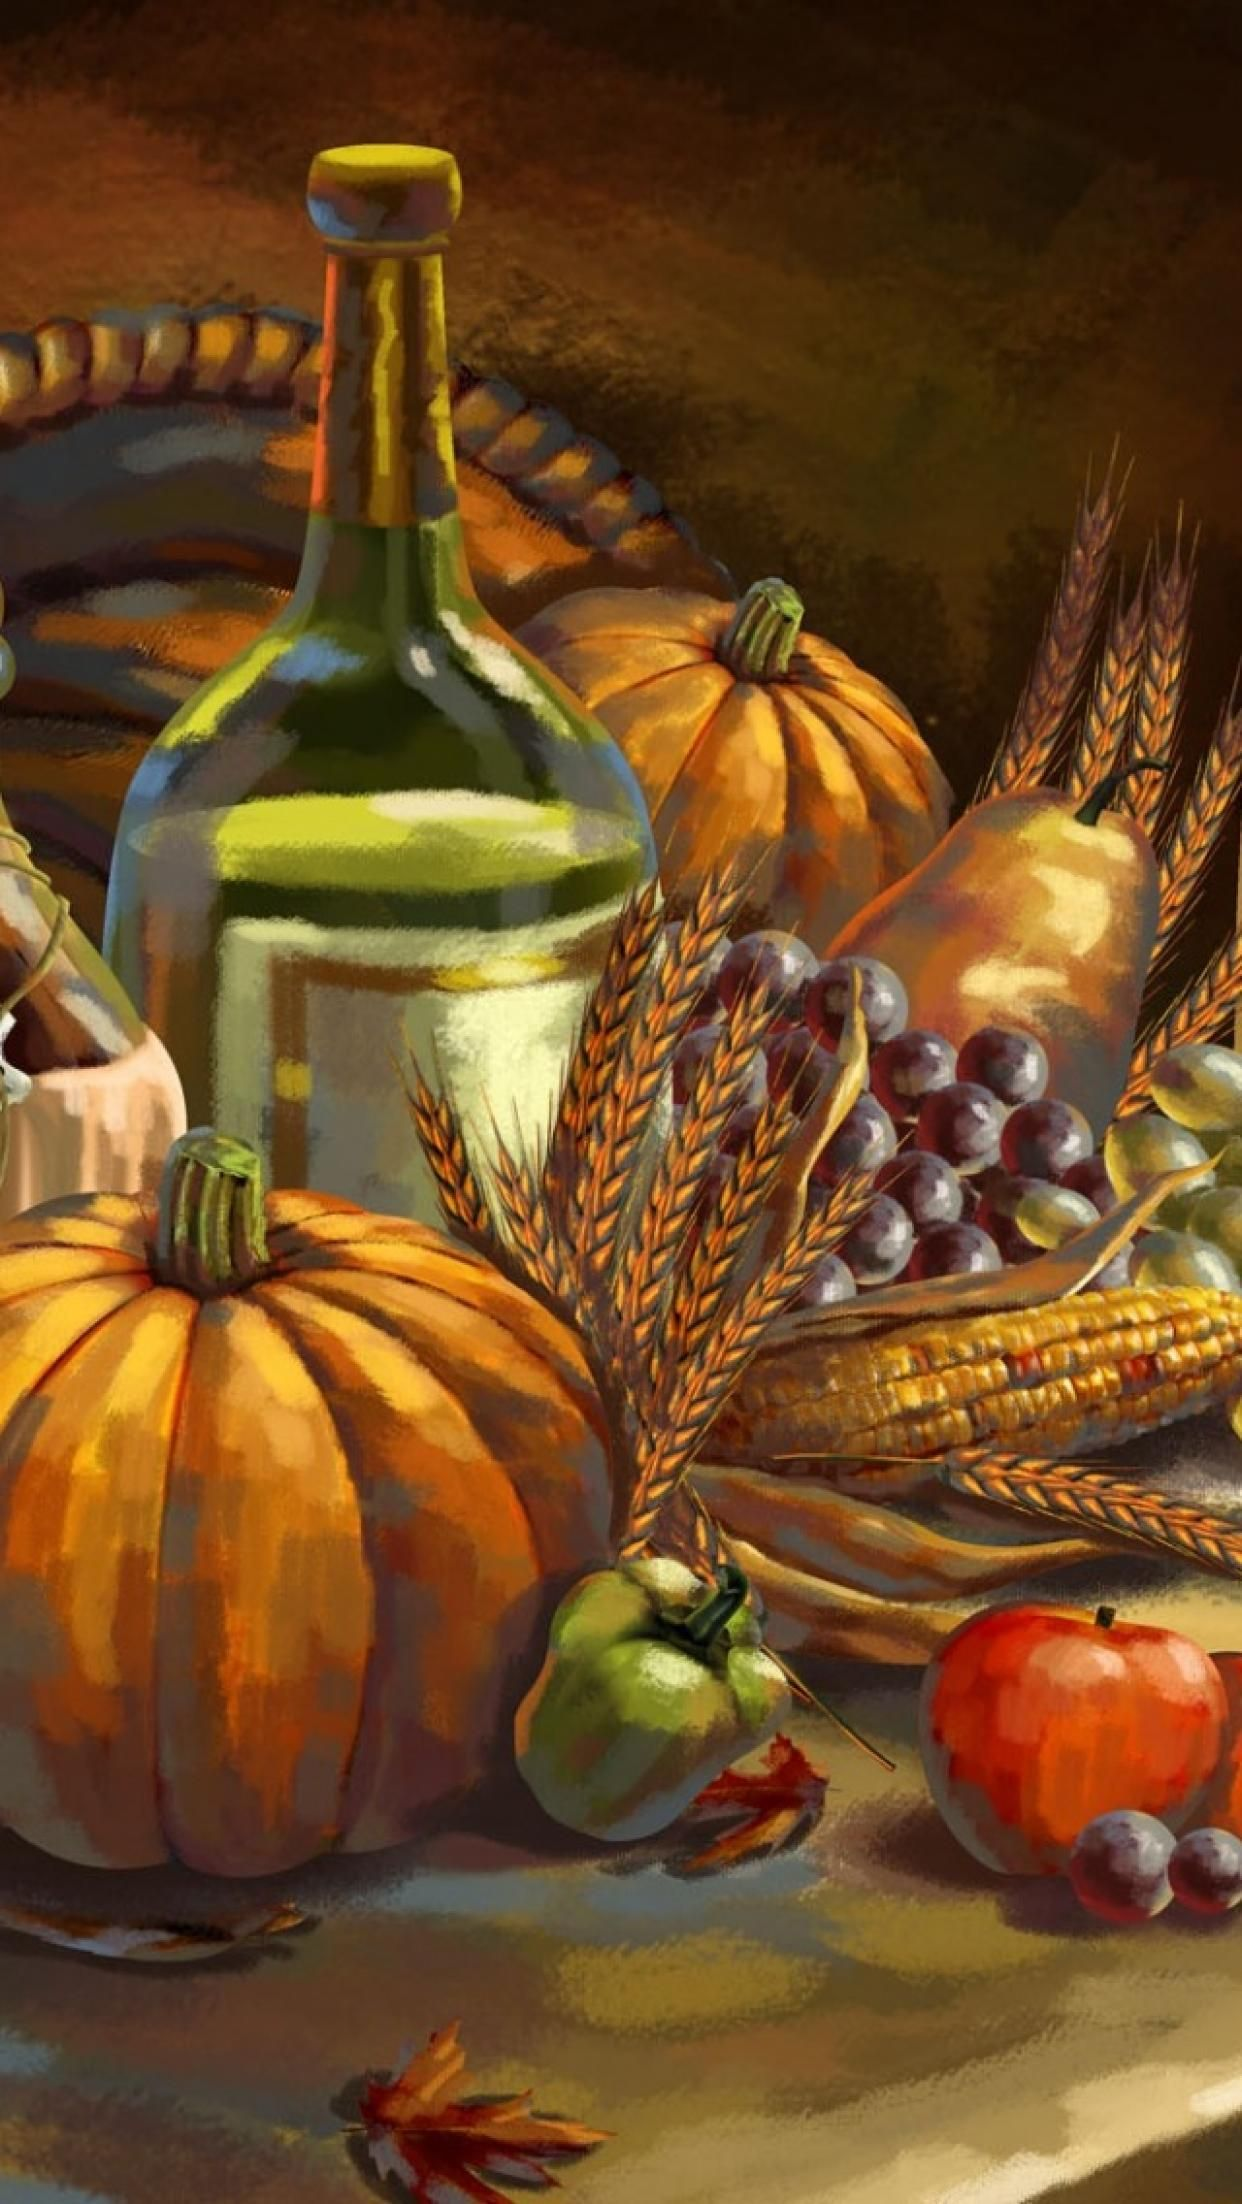 iphone 6 retina wallpaper Thanksgiving wallpaper